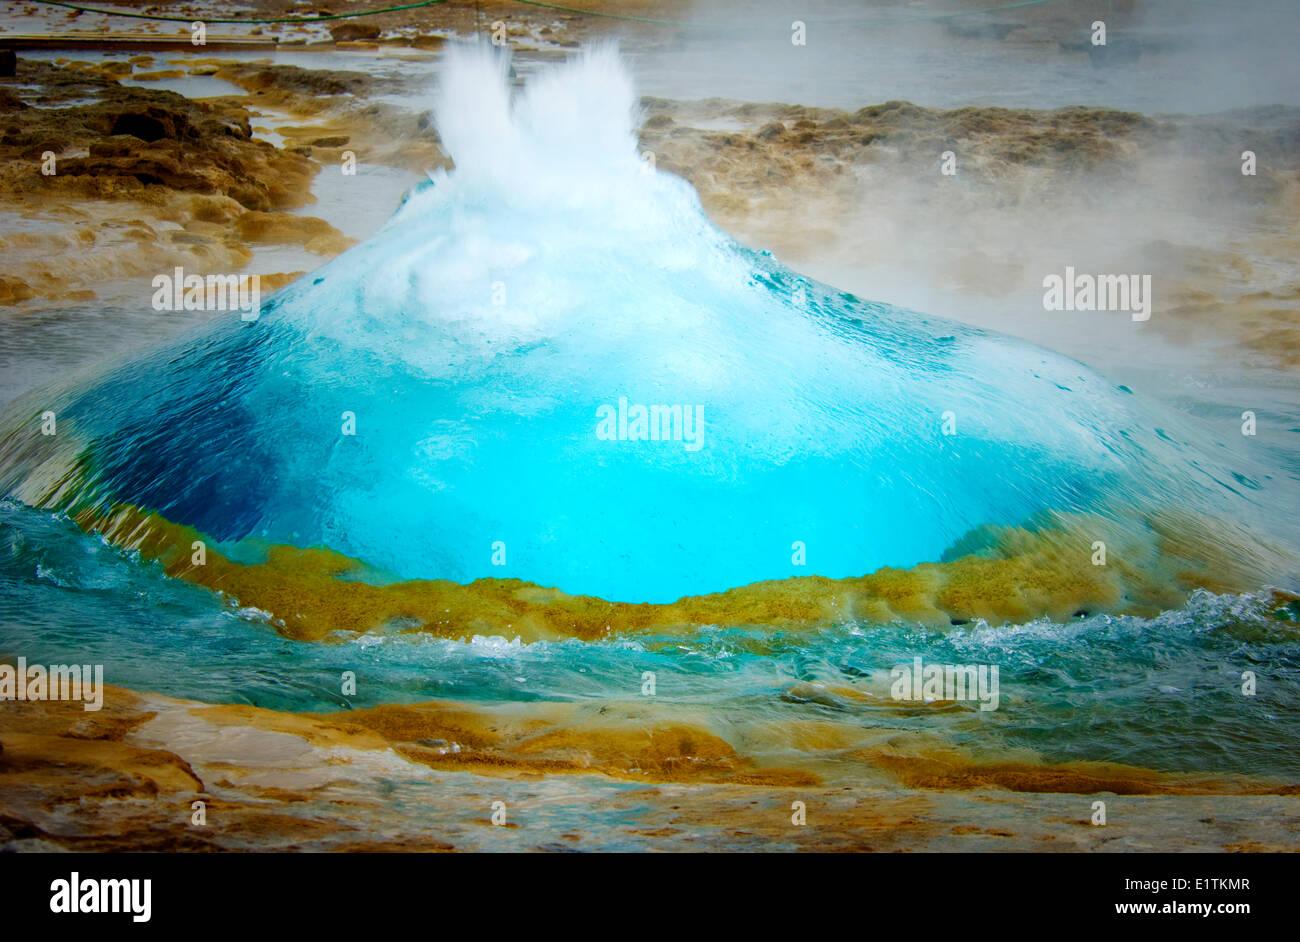 Great geyser erupting, Iceland - Stock Image